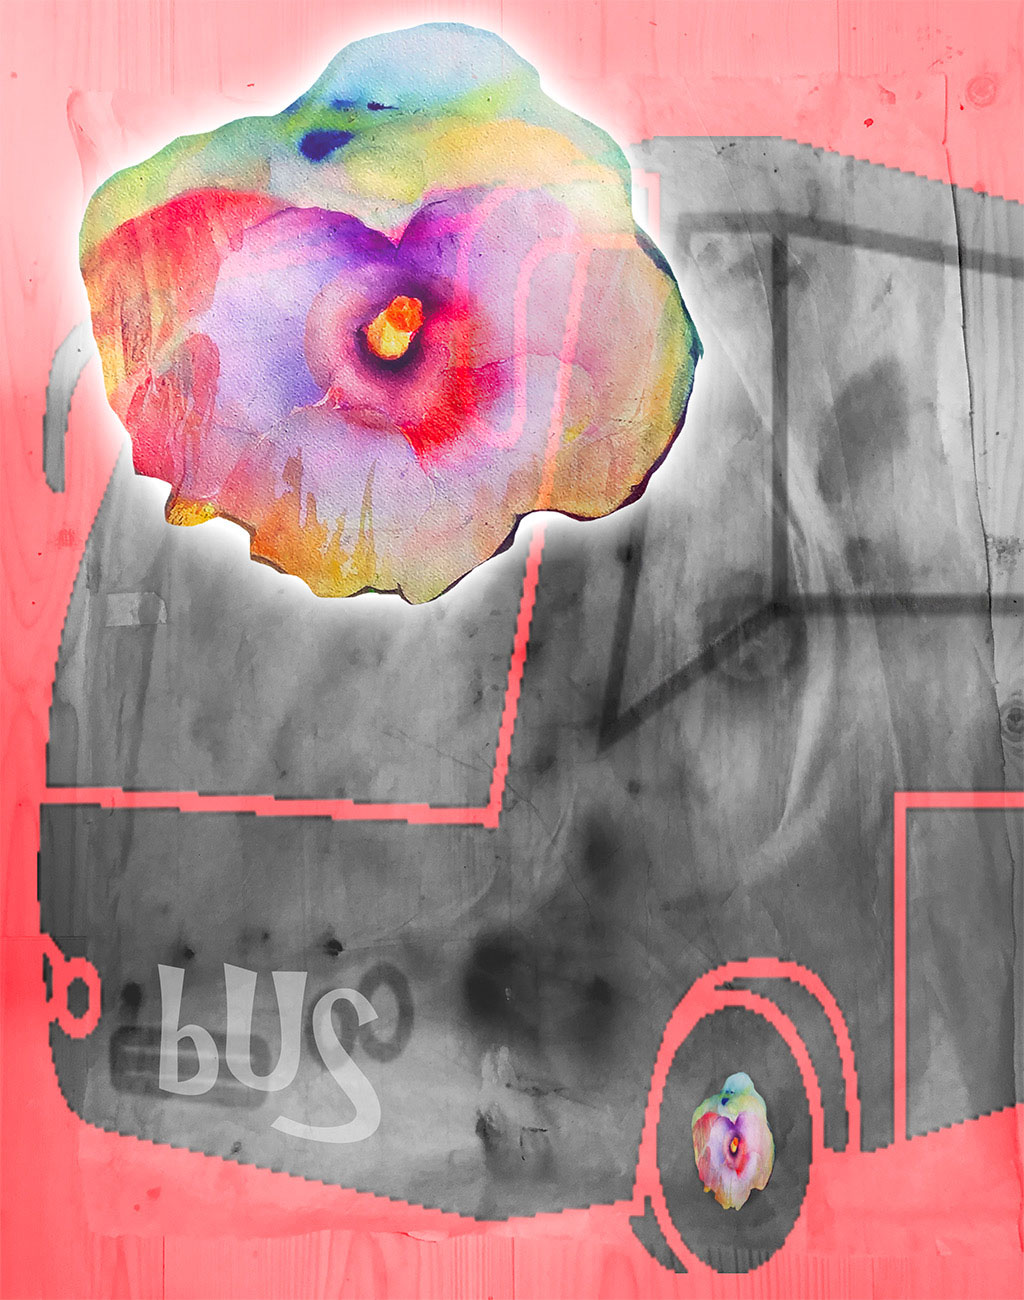 Bus - Inger Wilhelmsson 2021